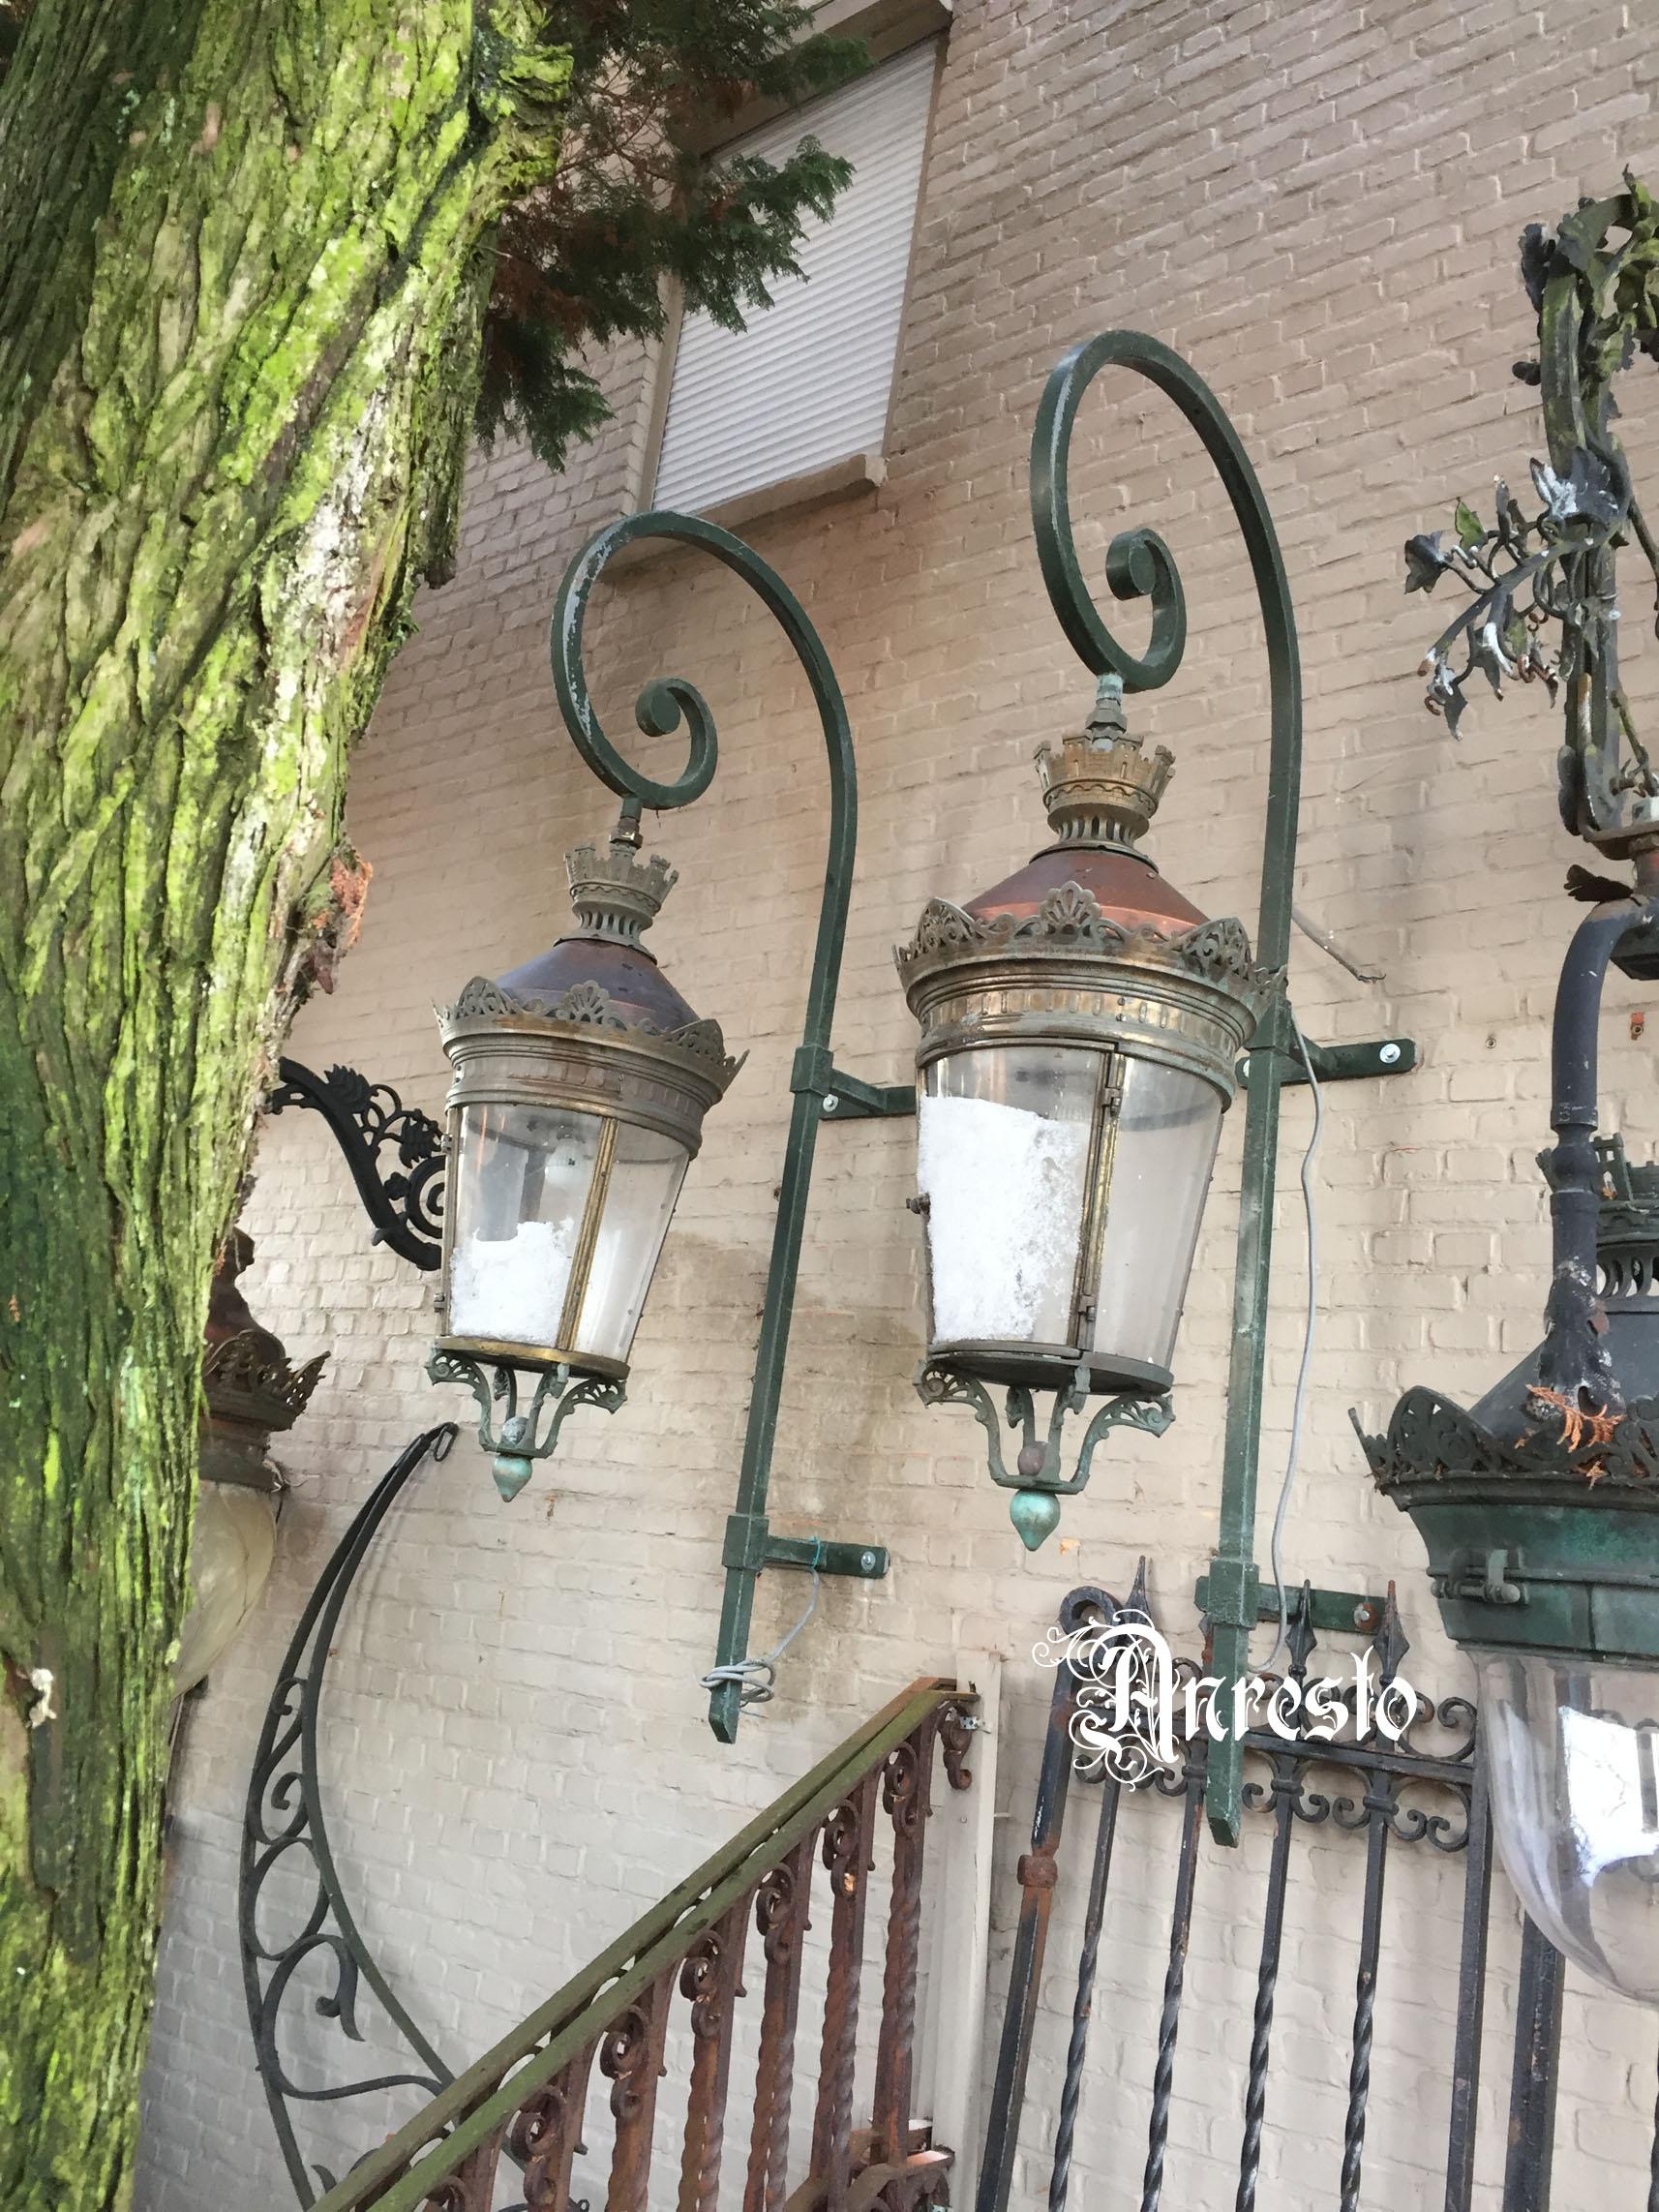 Ref. 15 - Antieke lampenkoppen, oude lantaarnkoppen